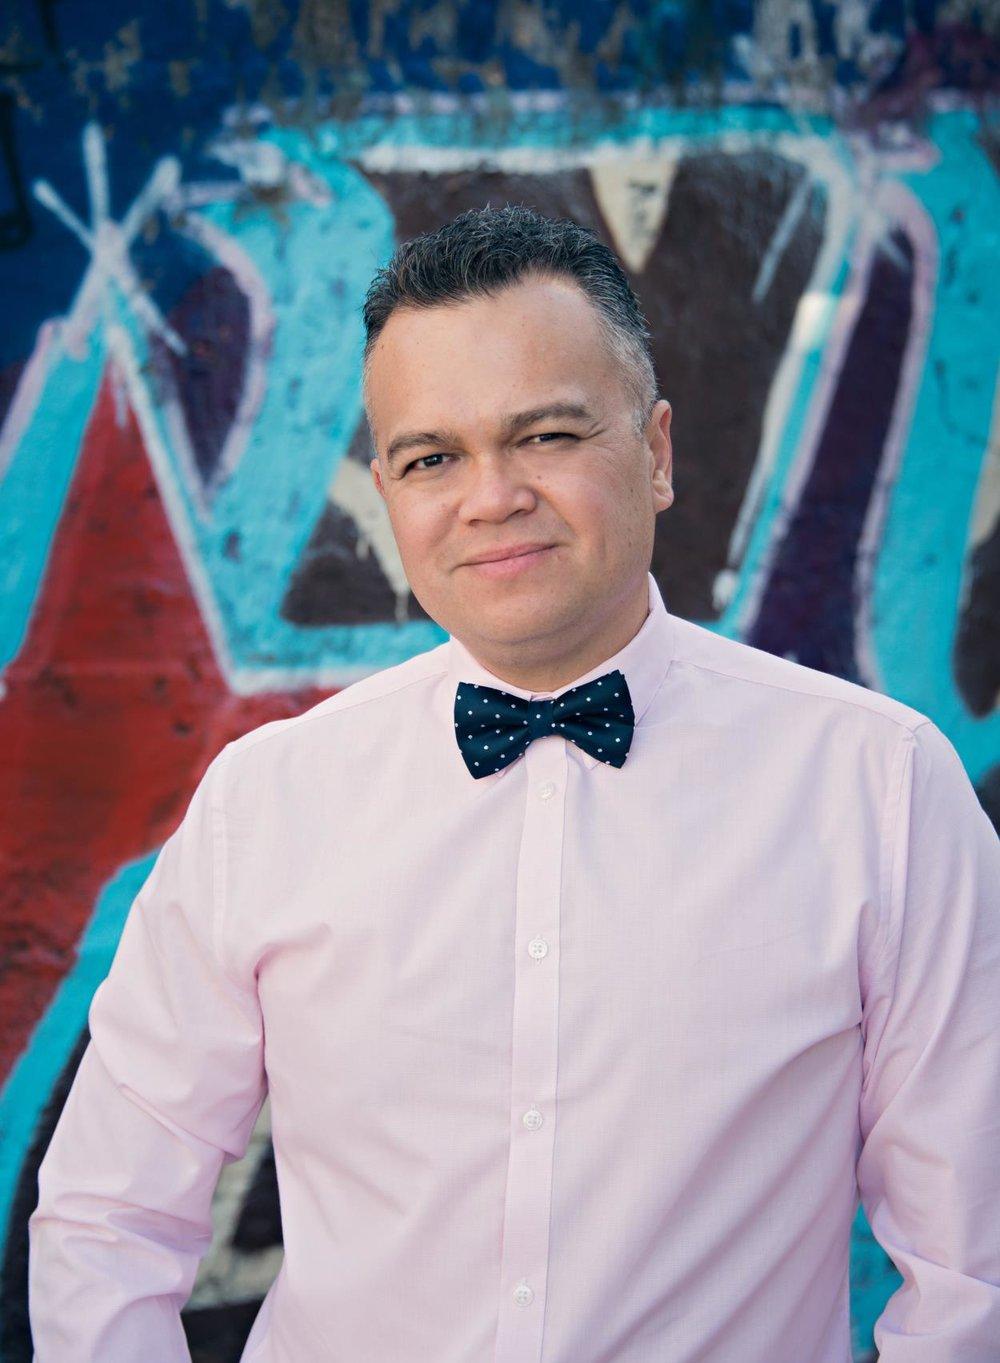 Councilmember David Oro